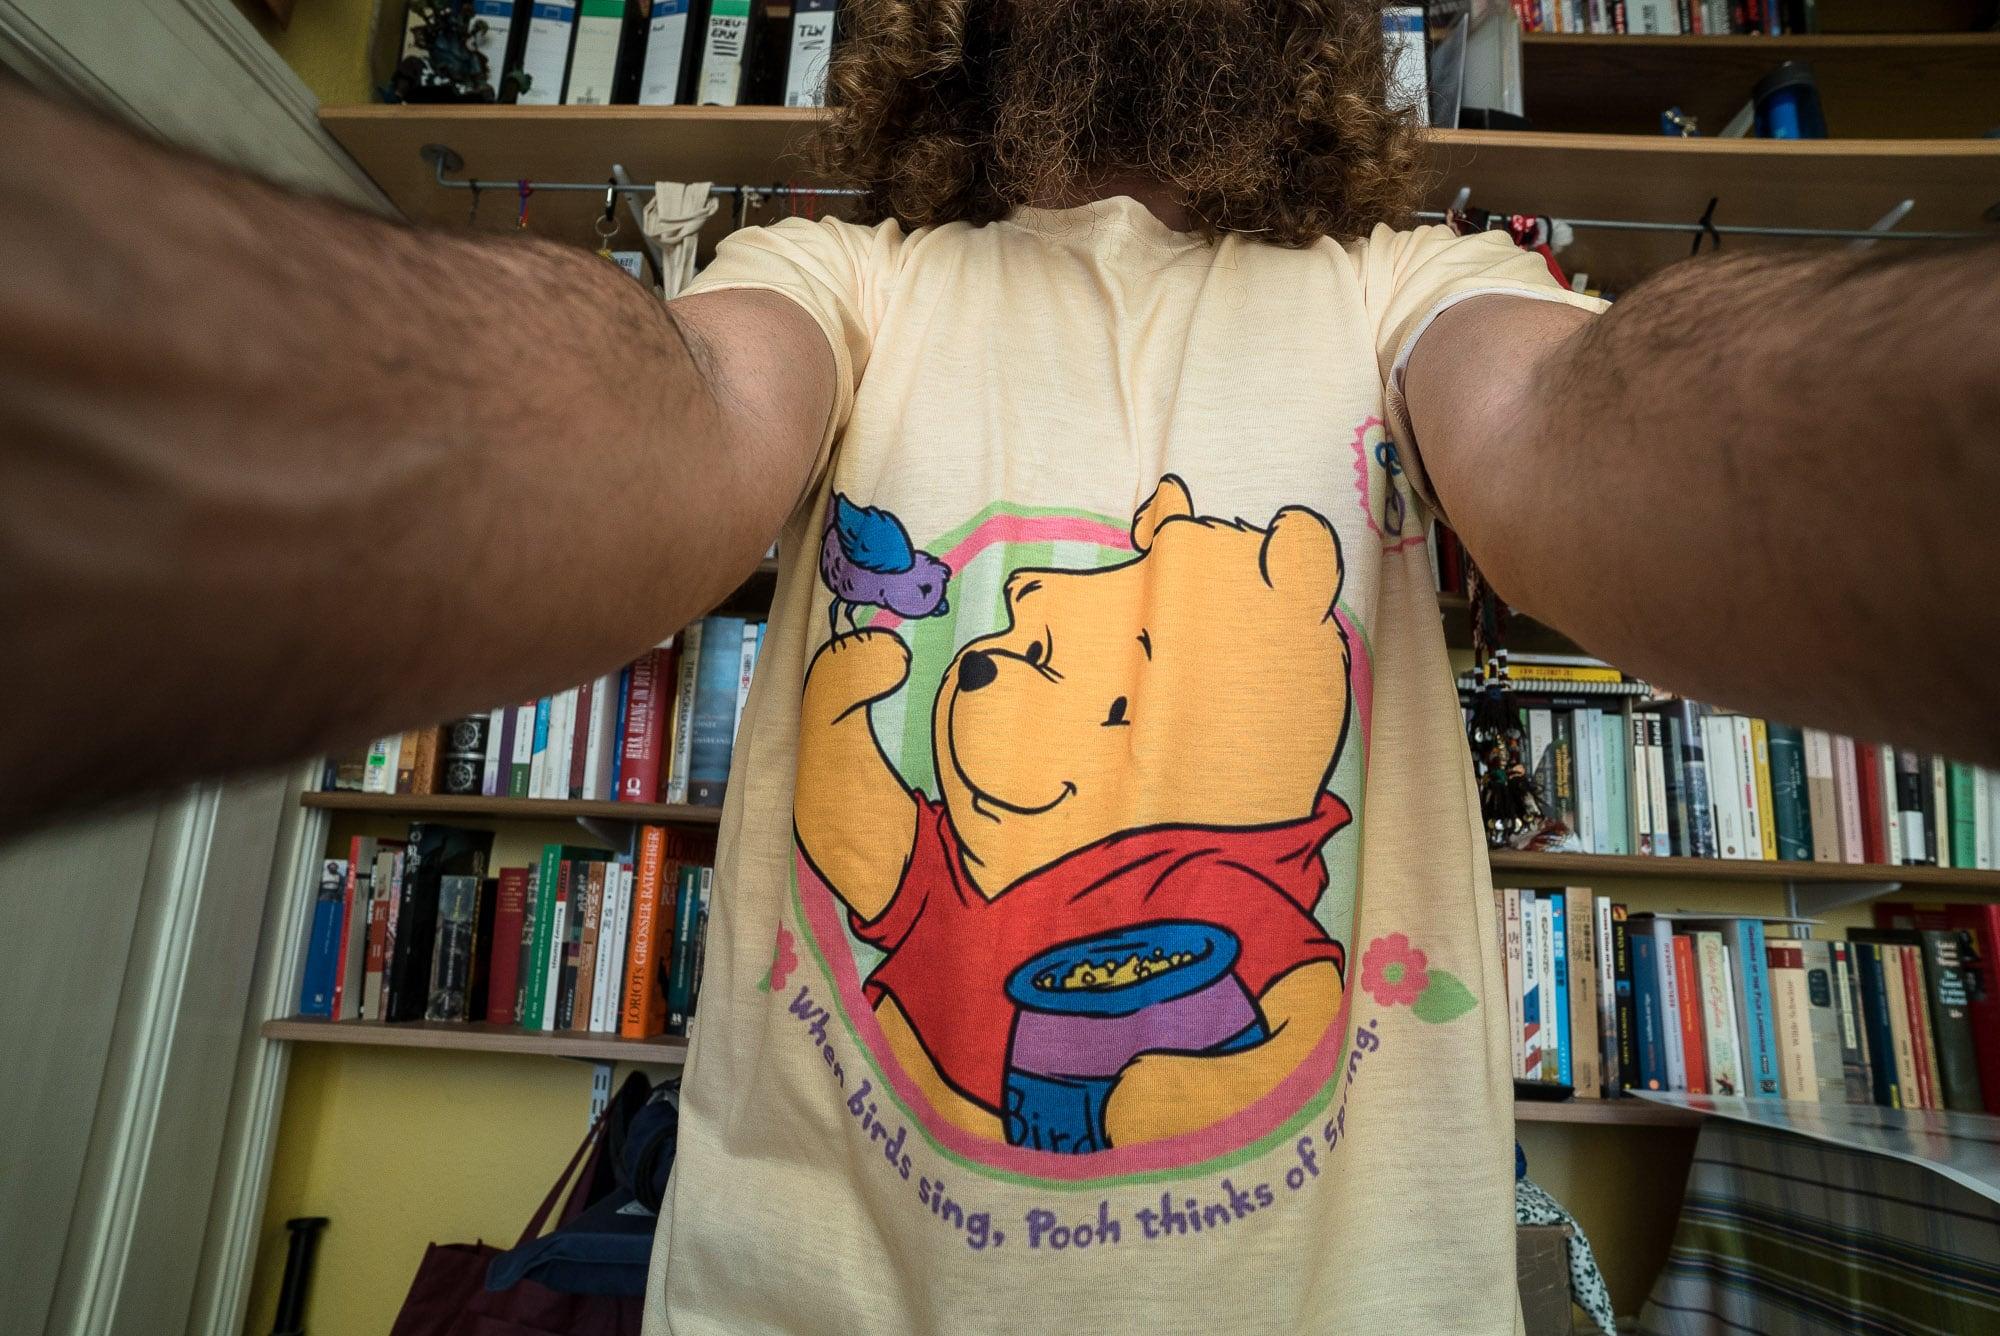 Winnie The Pooh shirt